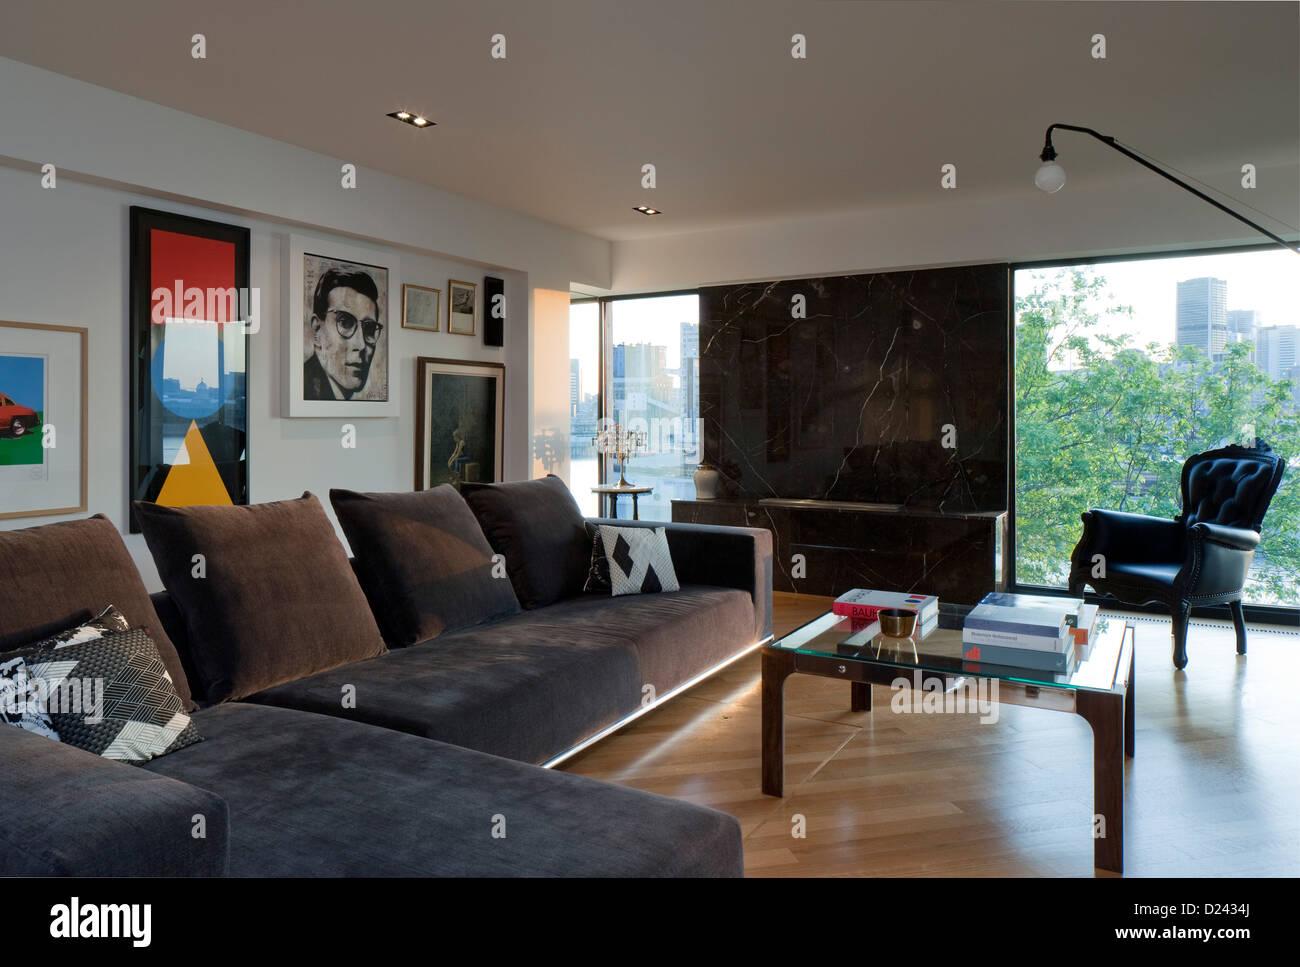 Habitat 67 Montreal Canada Architect Moshie Safdie 1967 Living Room